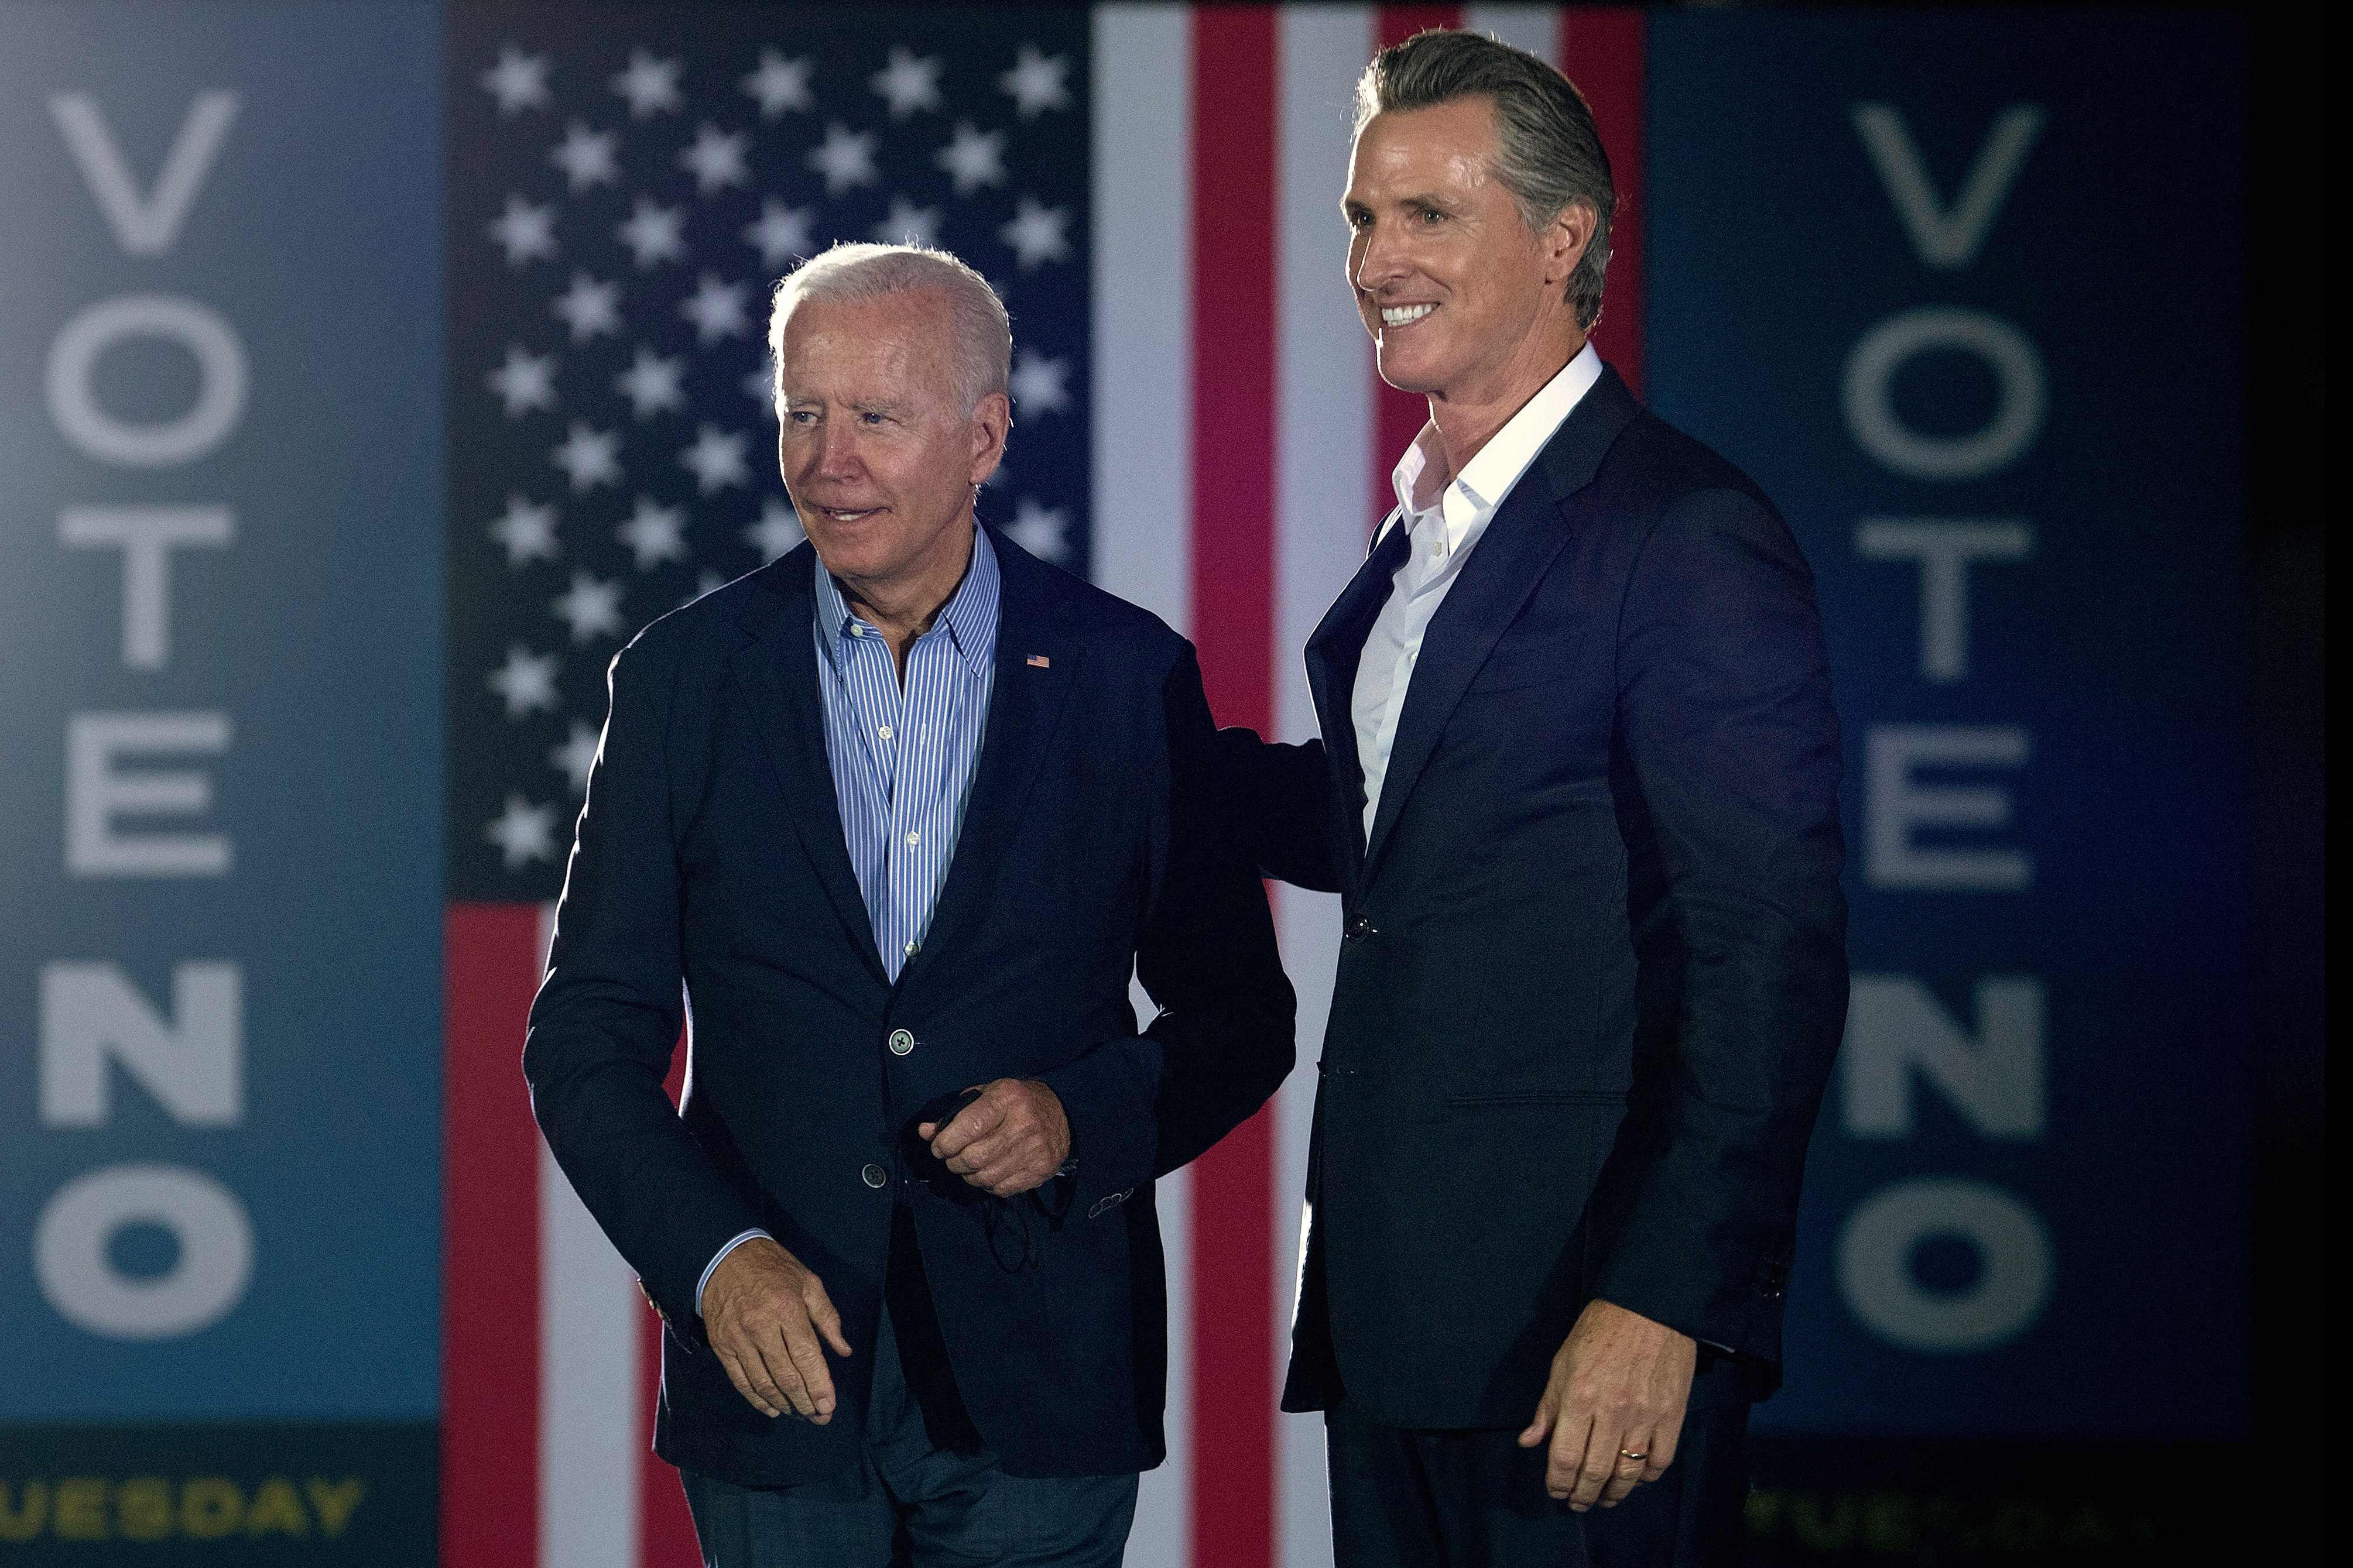 The polls are open in California: Gov. Gavin Newsom seeks to fend off Larry Elder in recall election